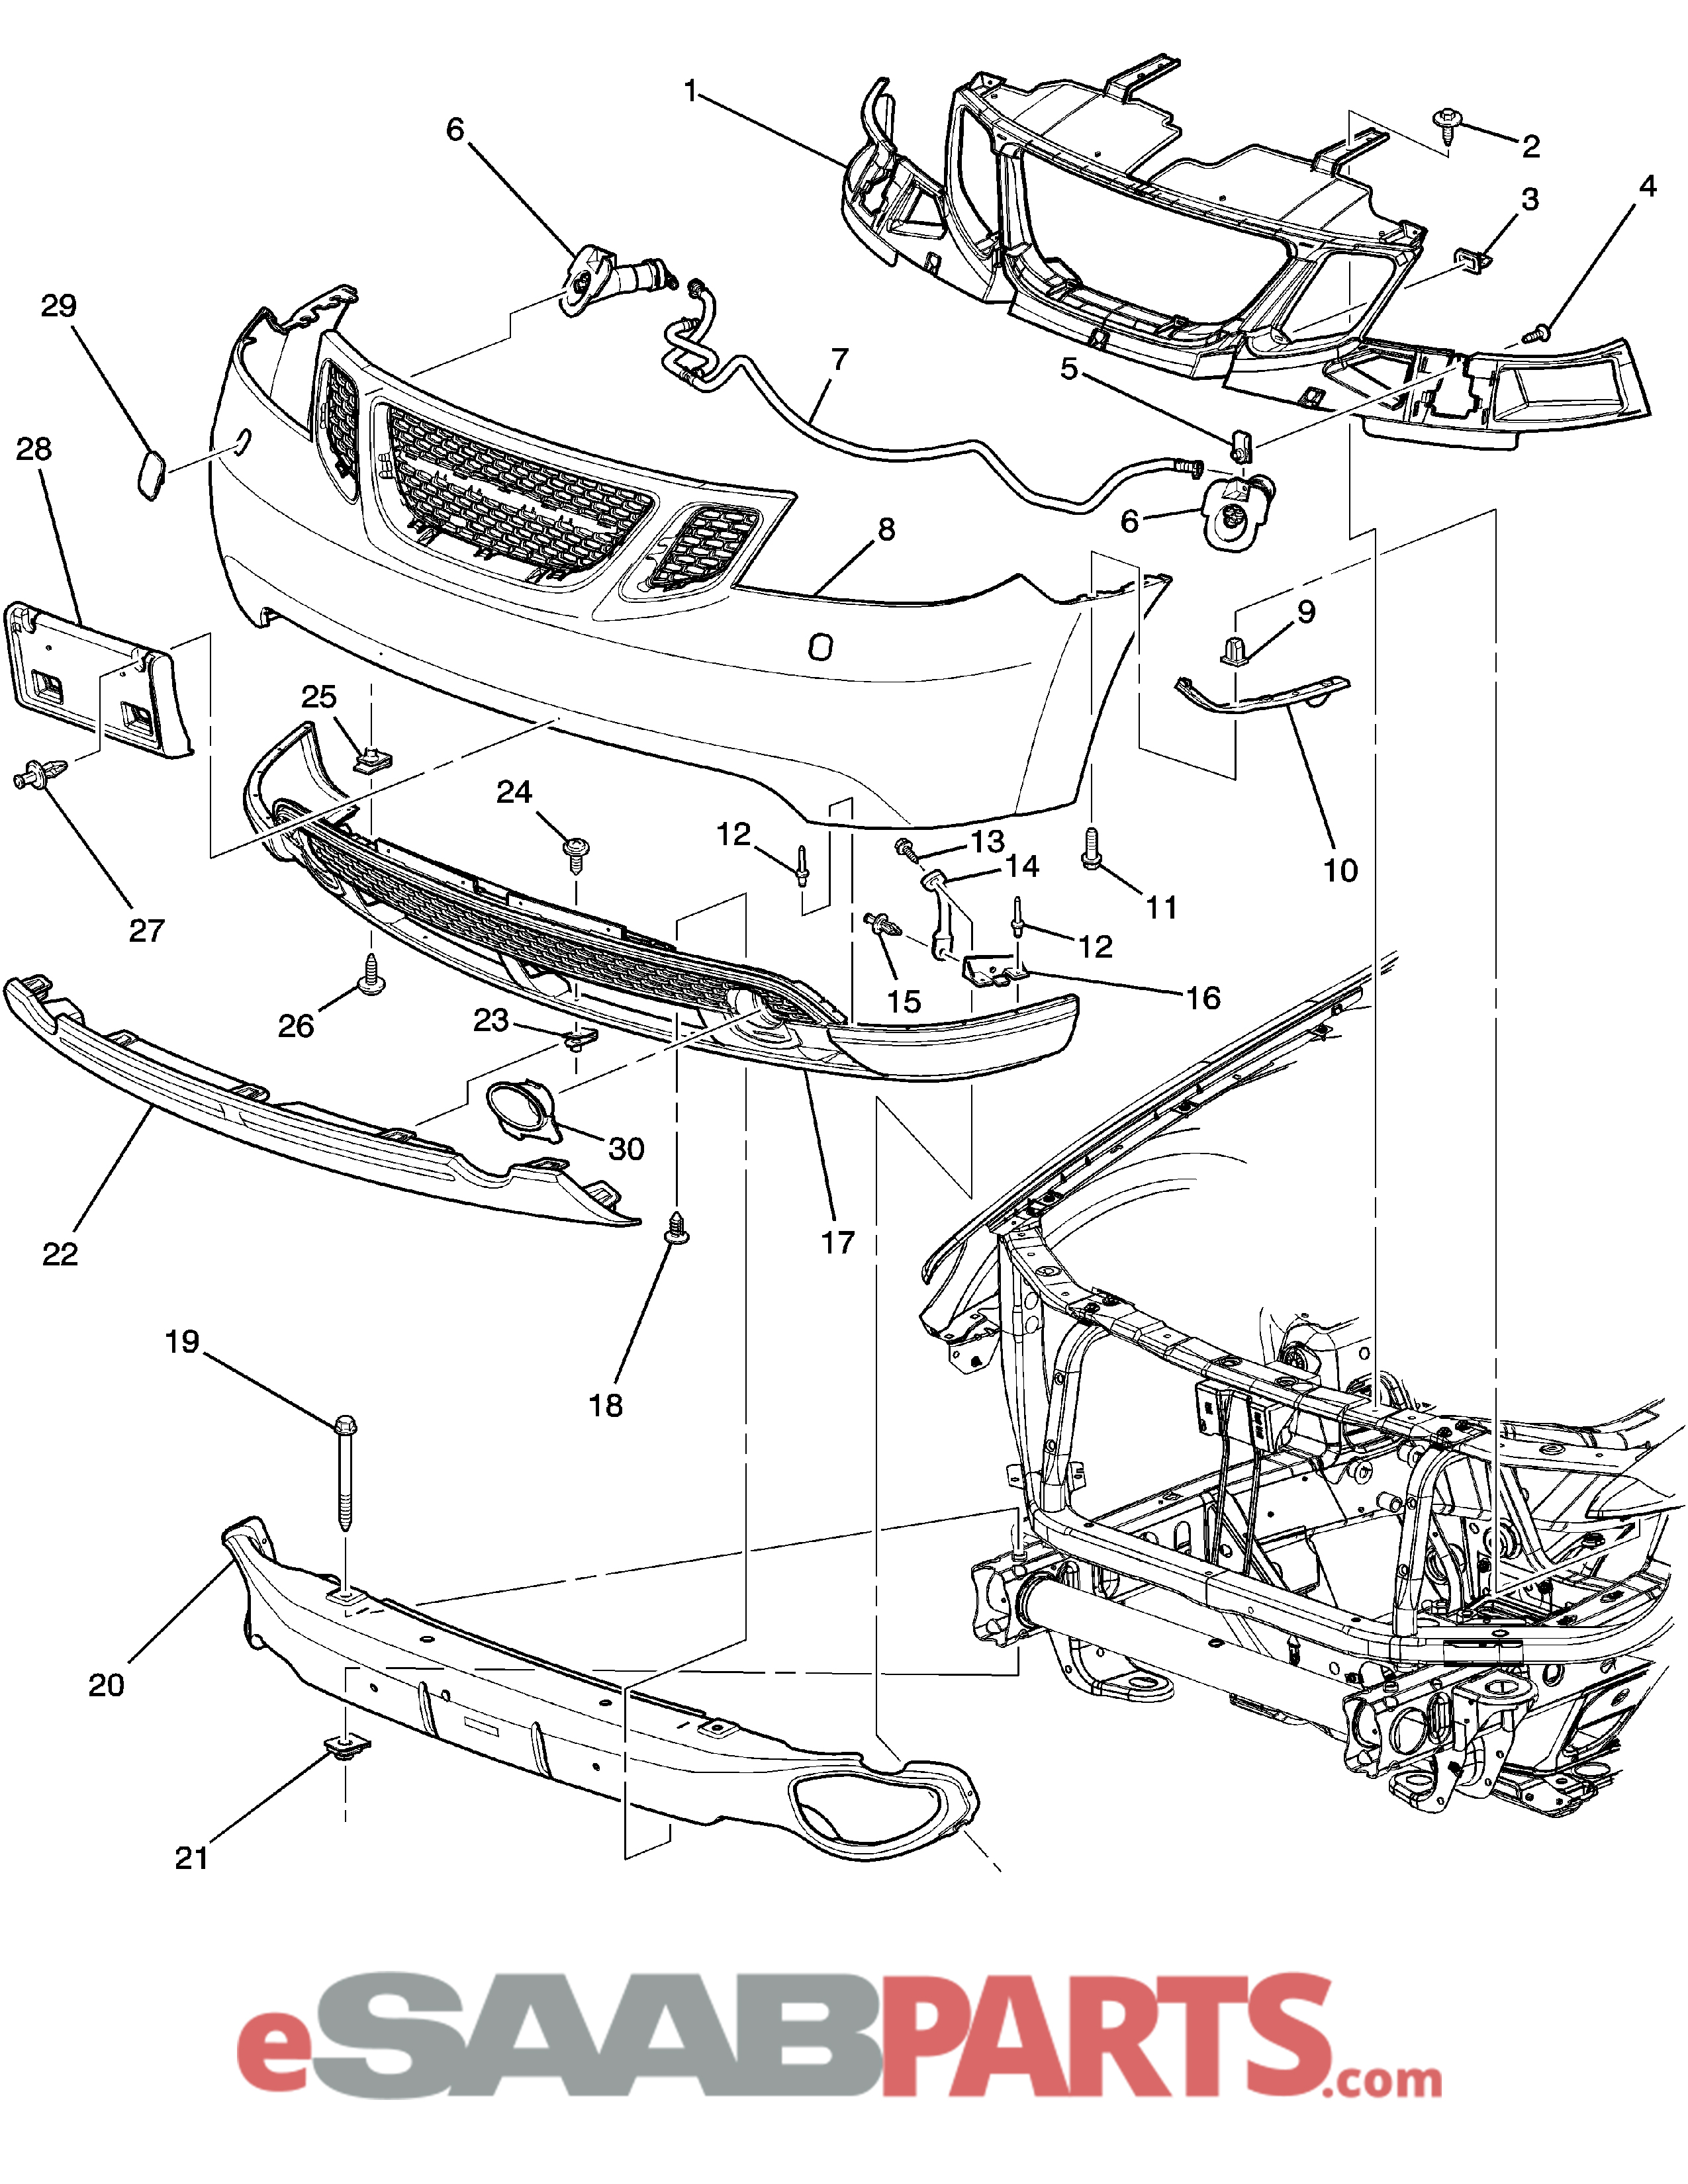 [19148957] SAAB 9-7X Front Bumper Cover (w/o Headlamp